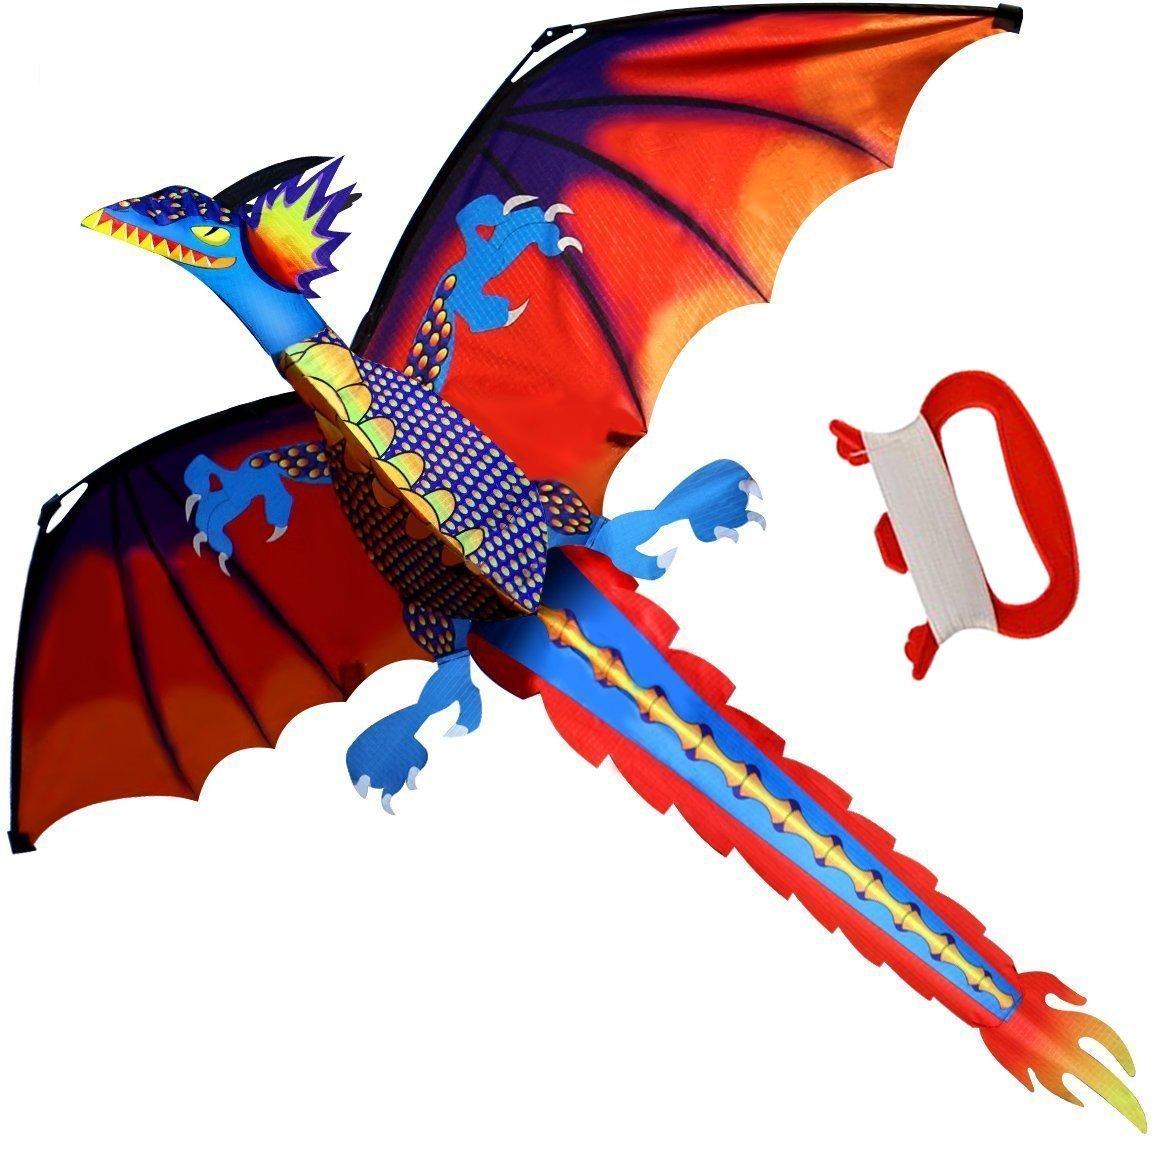 HENGDA KITE-Classical Dragon Kite 55inch x 47inch Single Line With Tail